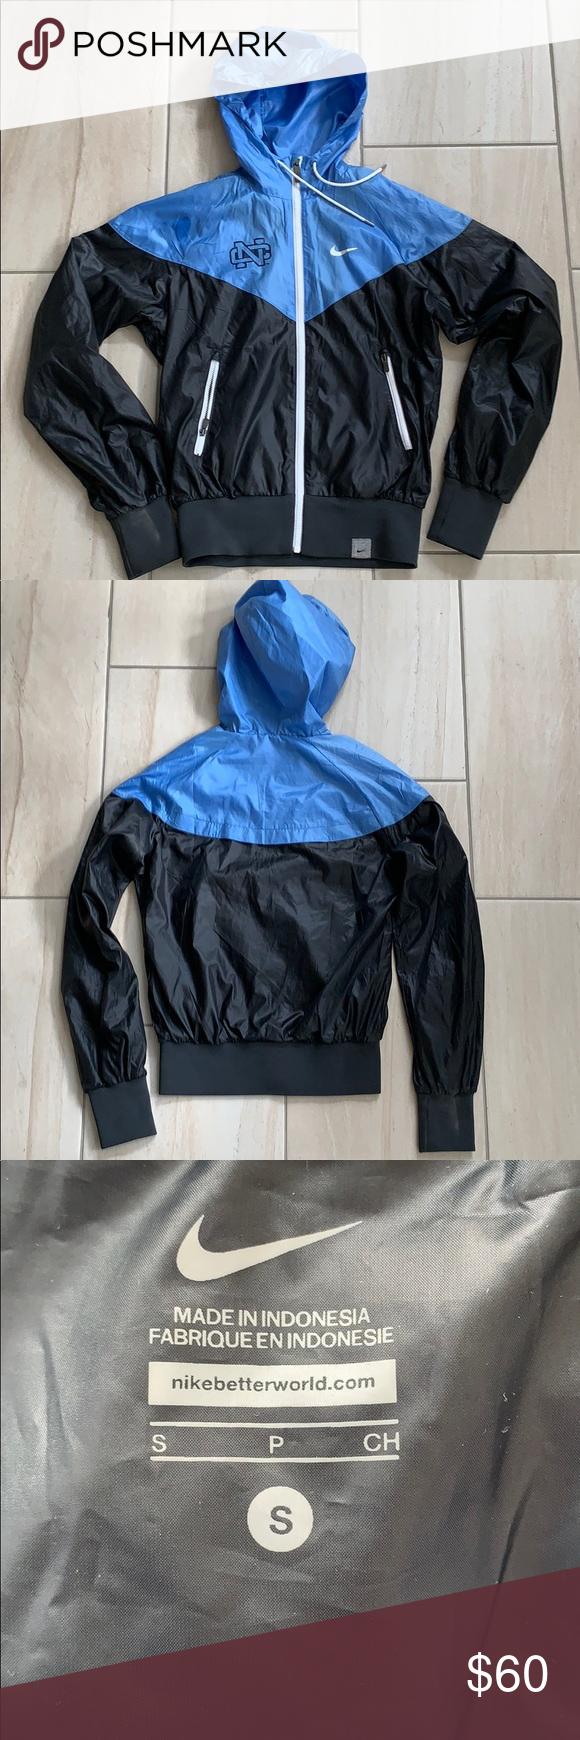 7e70b51e2c65 Nike NC black blue wind runner jacket size small The Nike Sportswear  Windrunner Women s Jacket